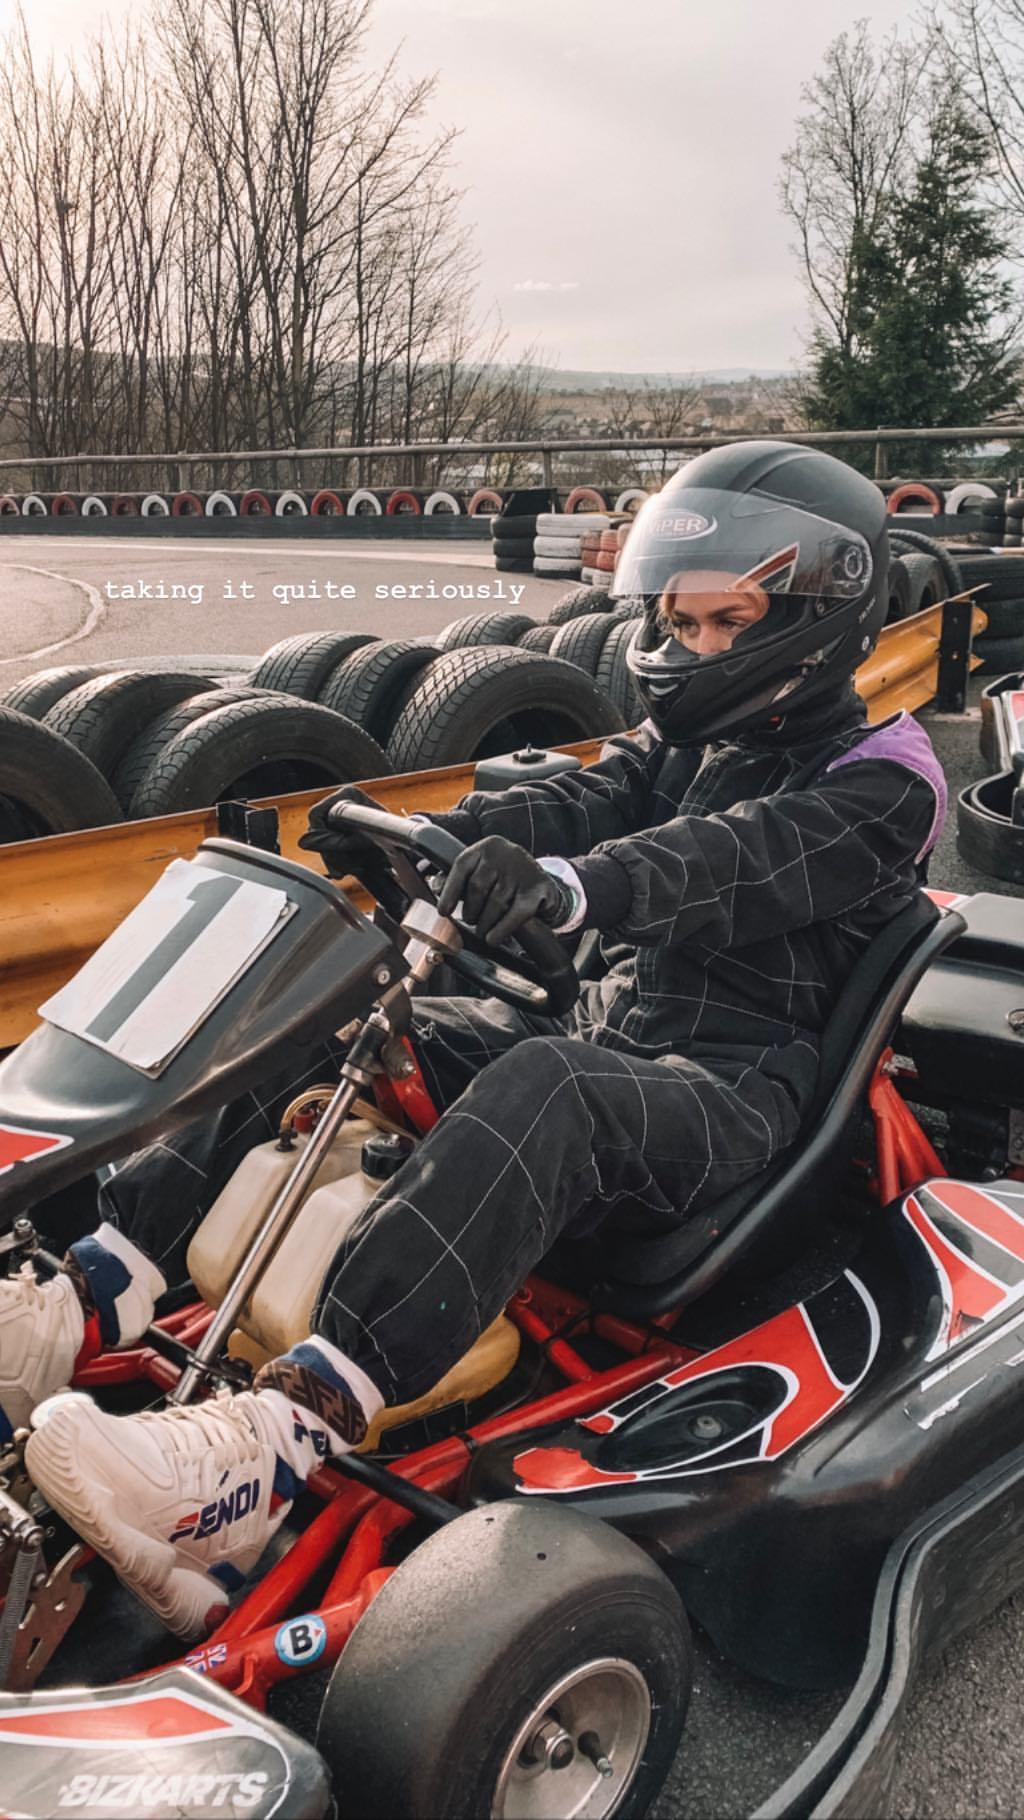 Lottie tomlinson poses on the go kart